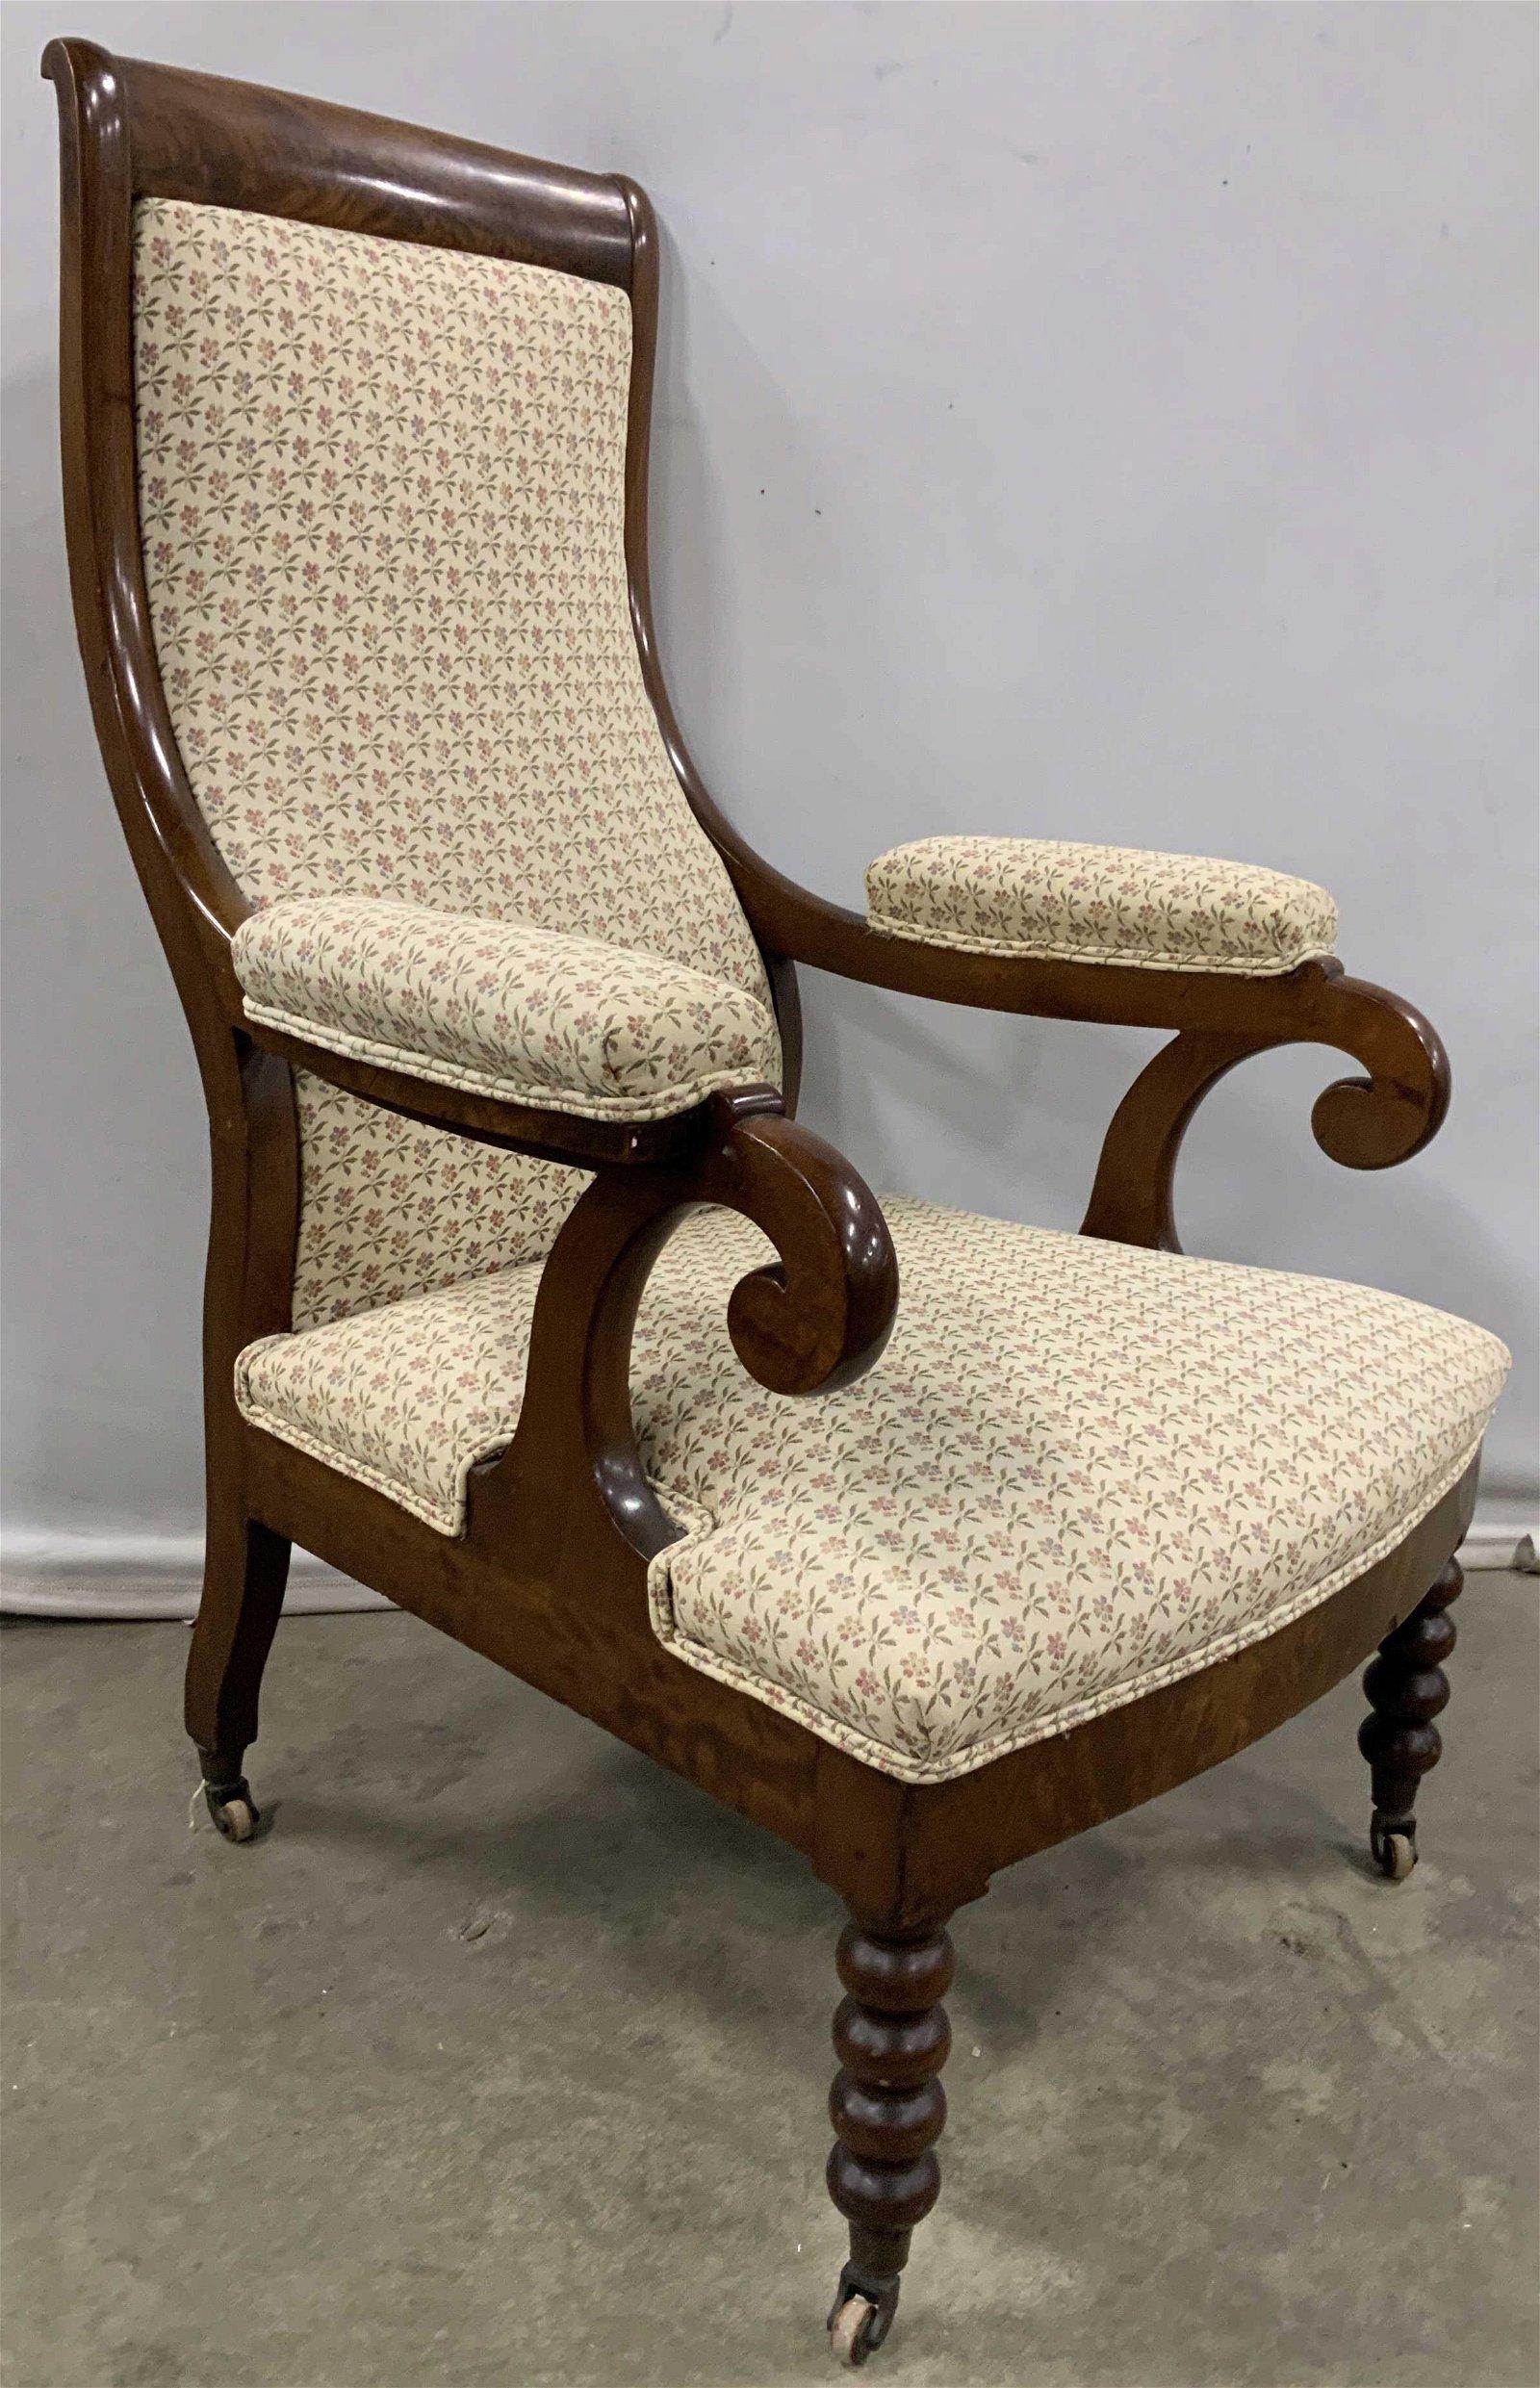 Antique Victorian High Back Arm Chair, C1850